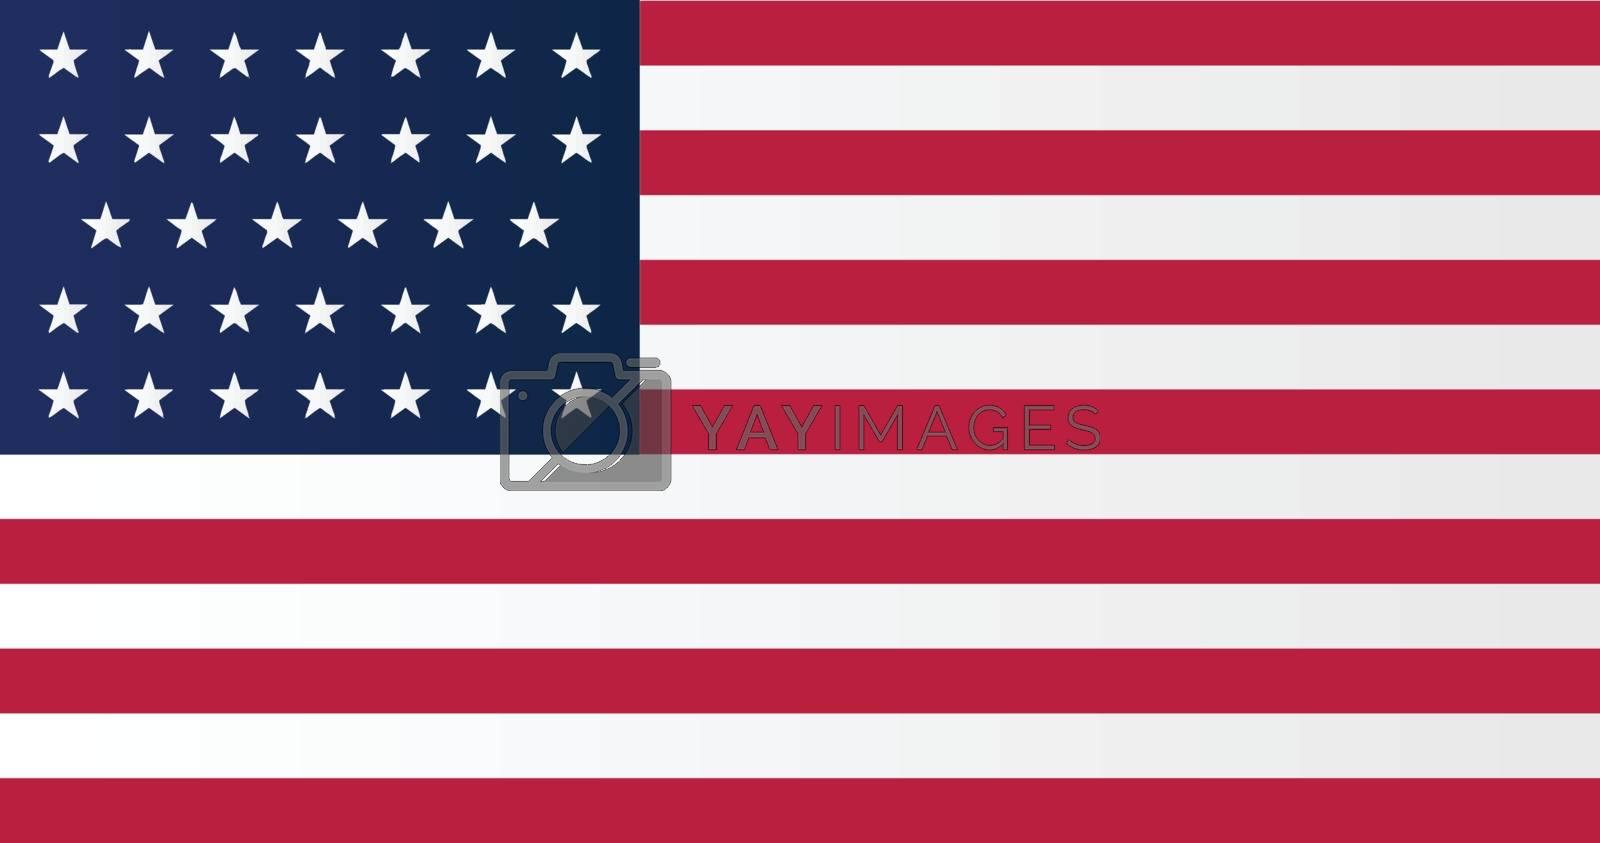 A Union side civil war stars and stripes flag